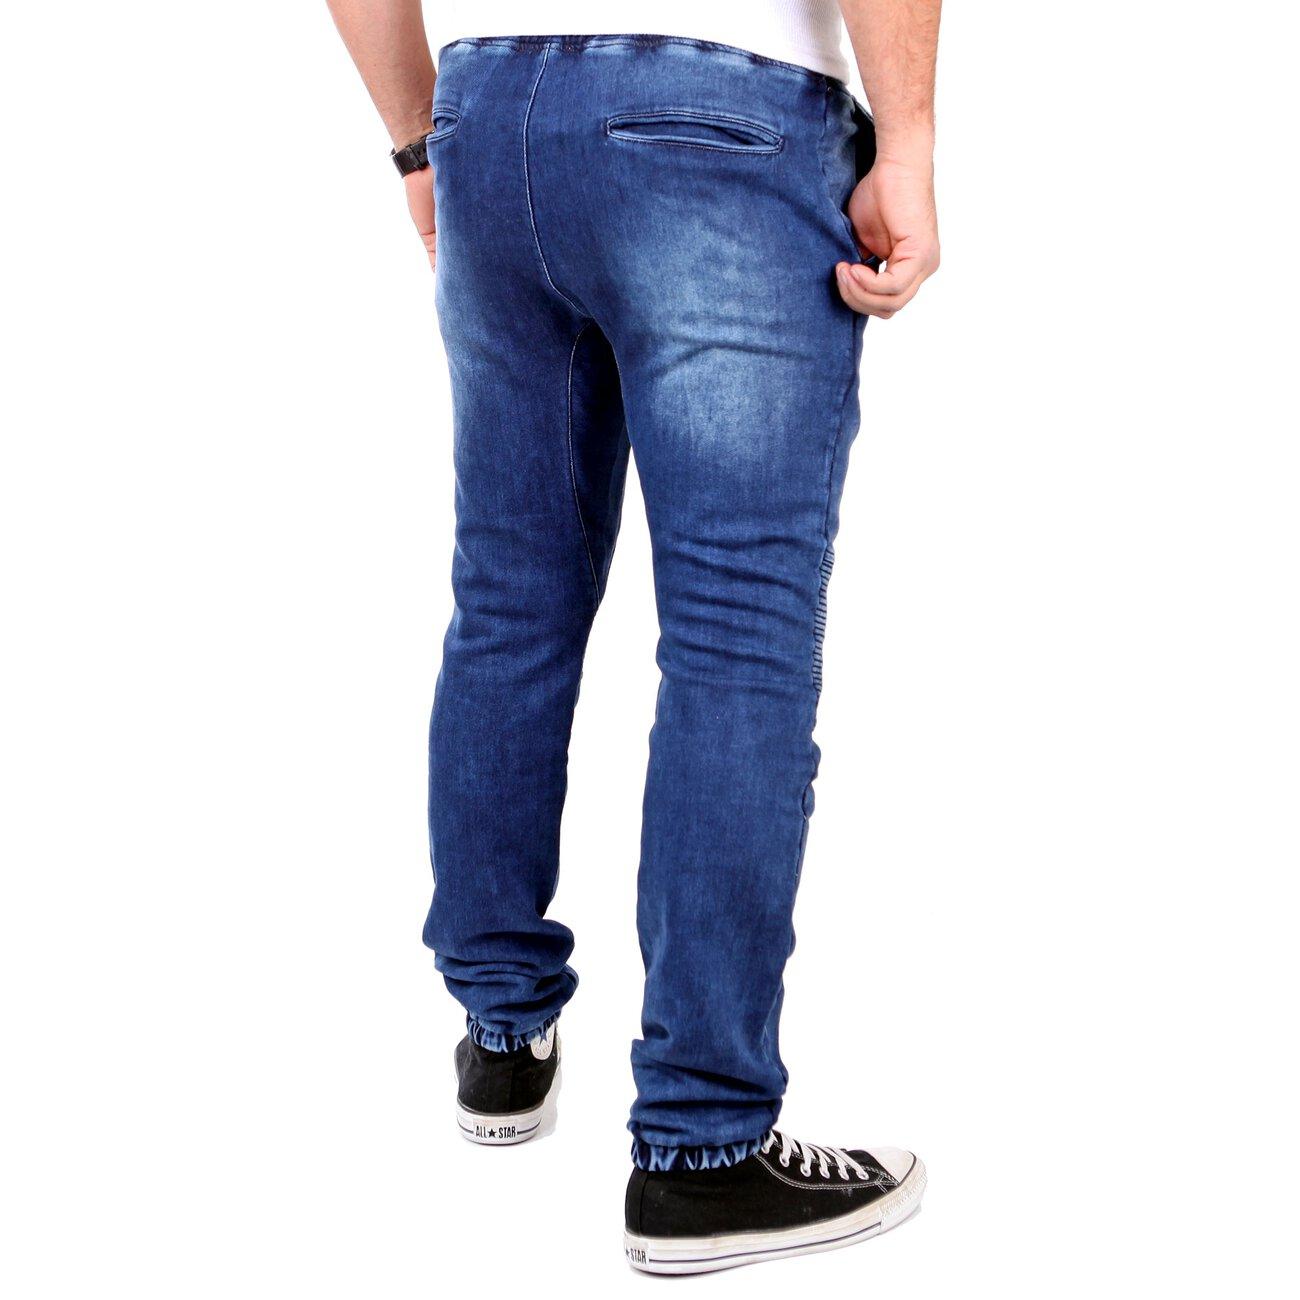 tazzio herren jeans jogginghose sweatpant jogg jeans biker. Black Bedroom Furniture Sets. Home Design Ideas